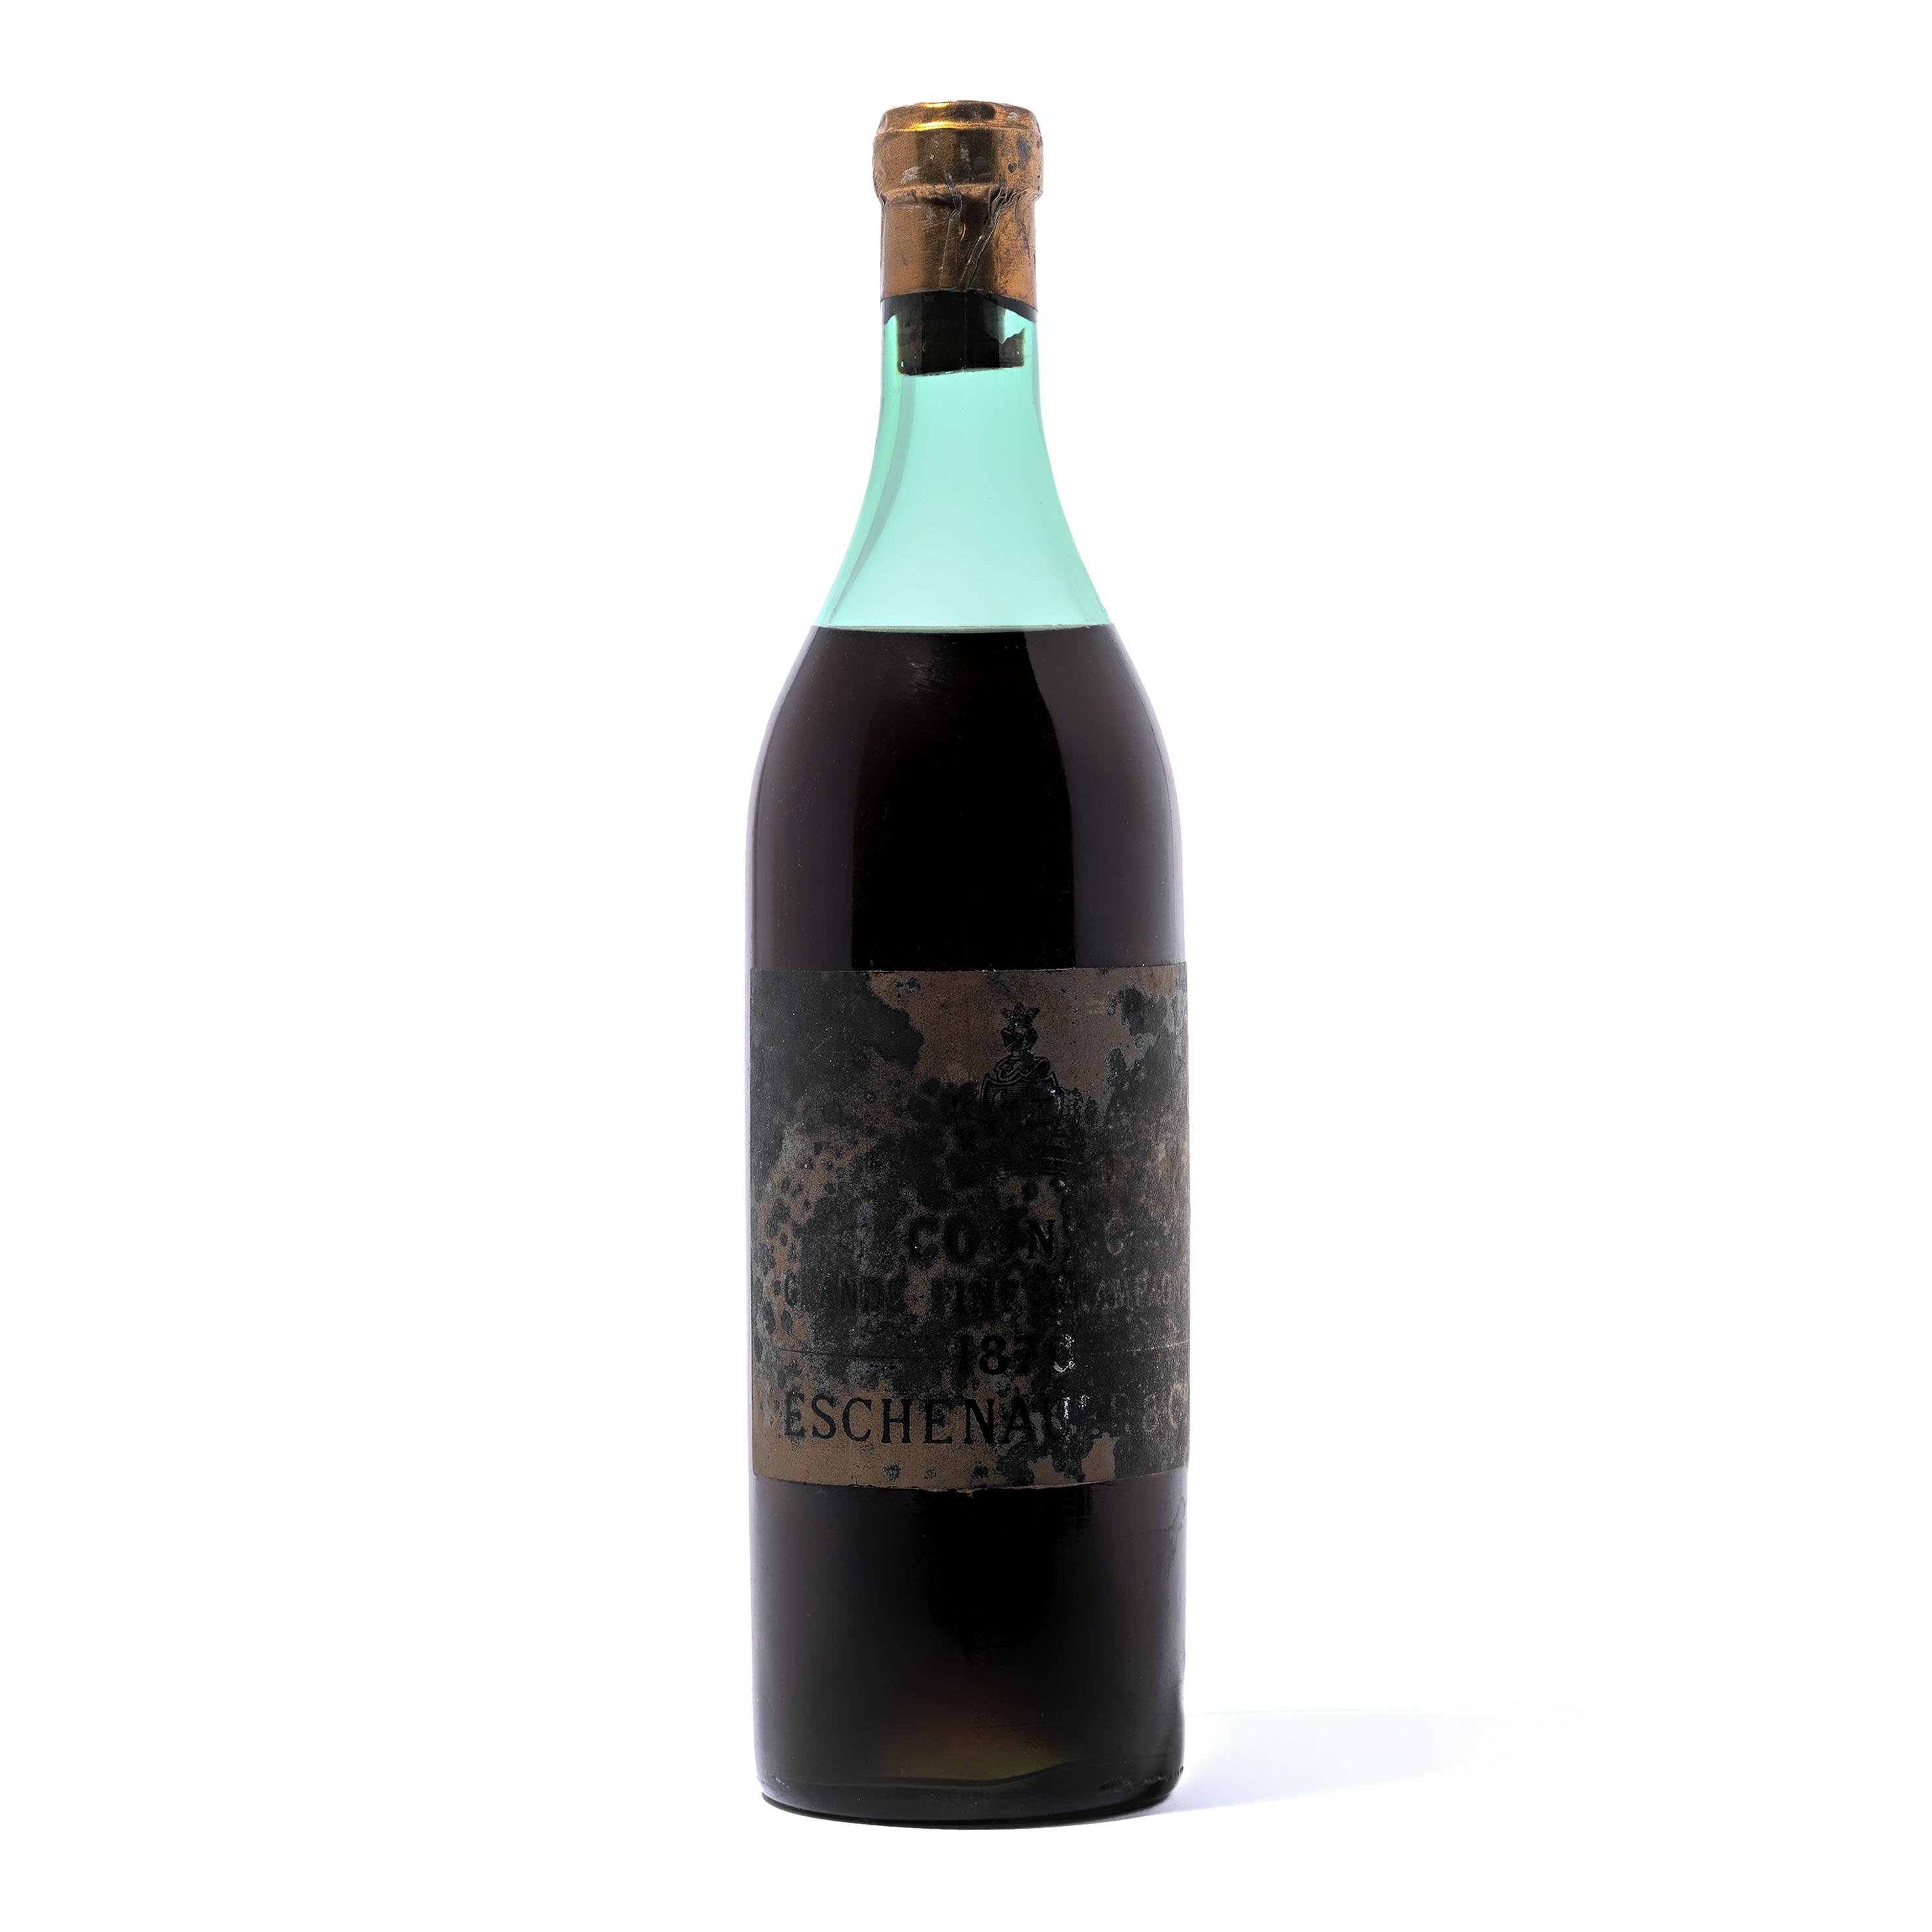 Lot 276 - 1 bottle 1870 Eschenauer Grande Fine Champagne Cognac